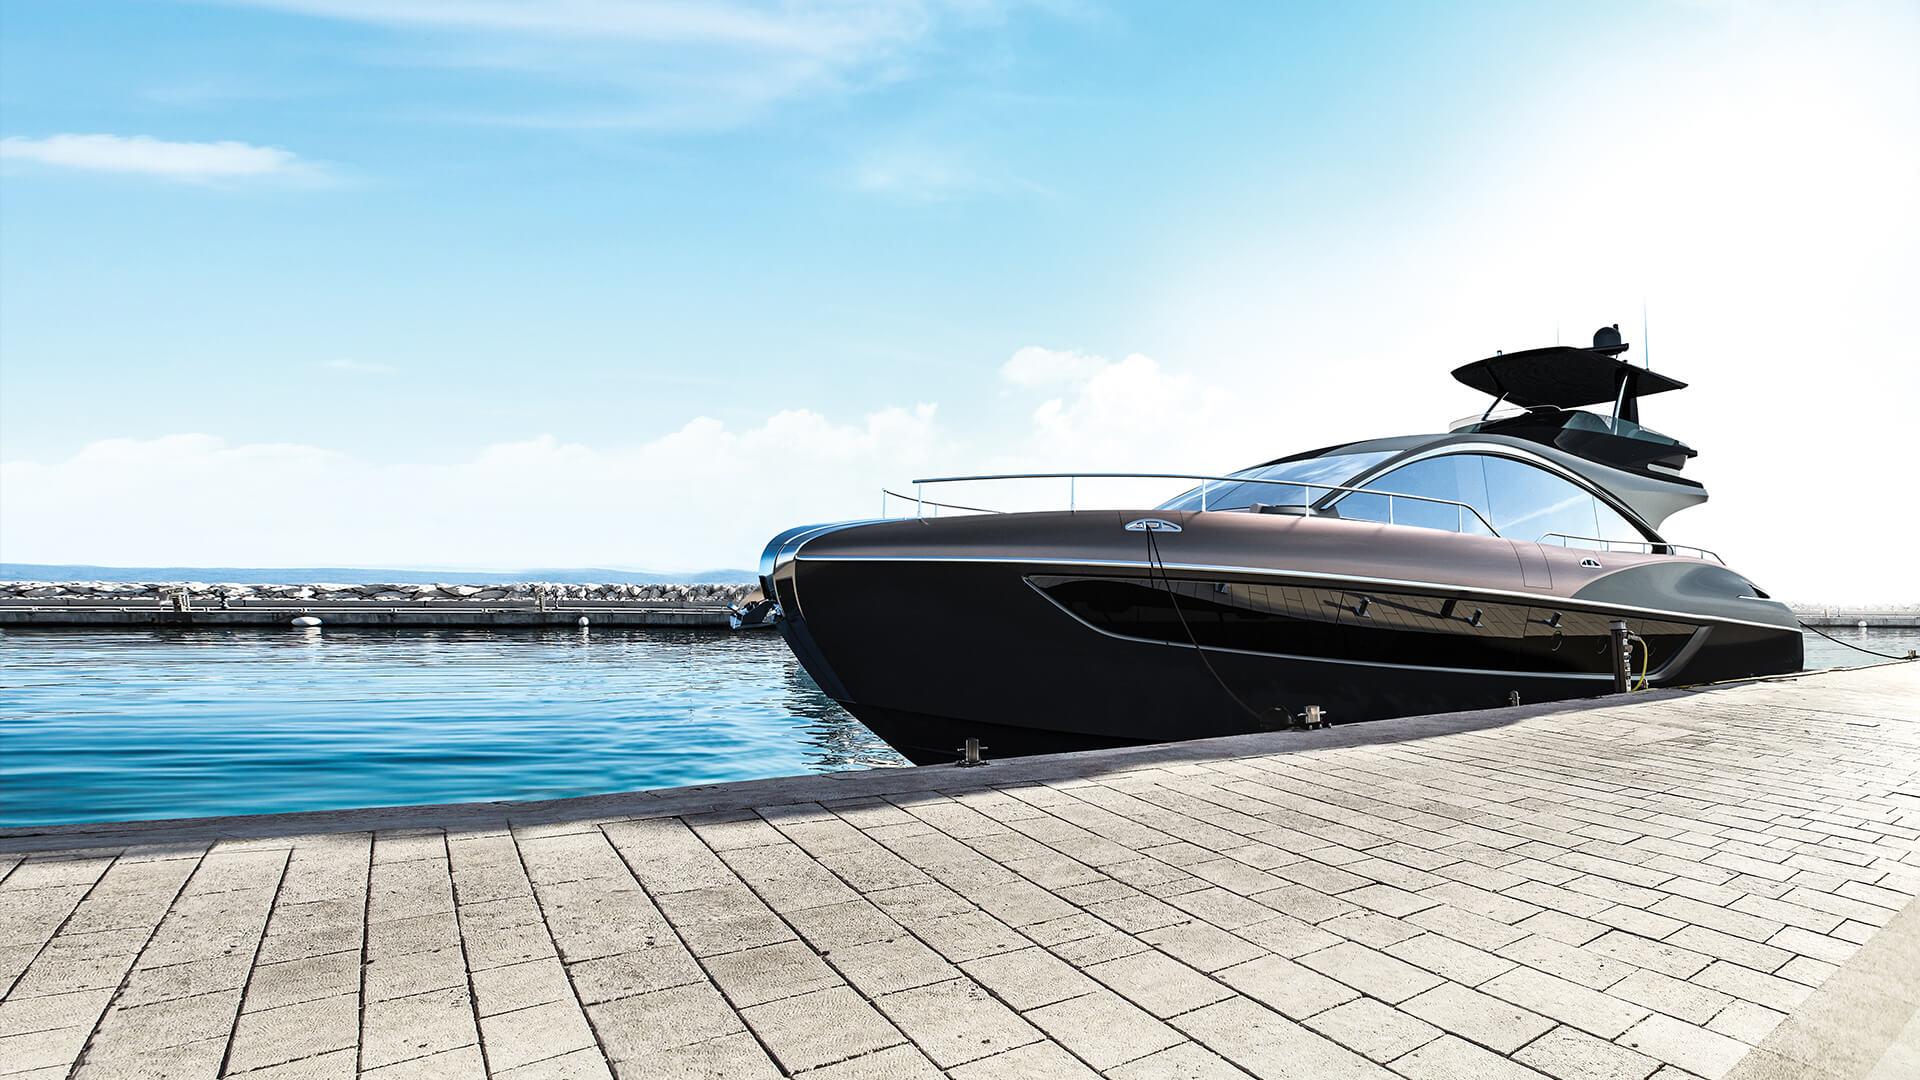 lexus-trinh-lang-mau-du-thuyen-hang-sang-ly-650-concept